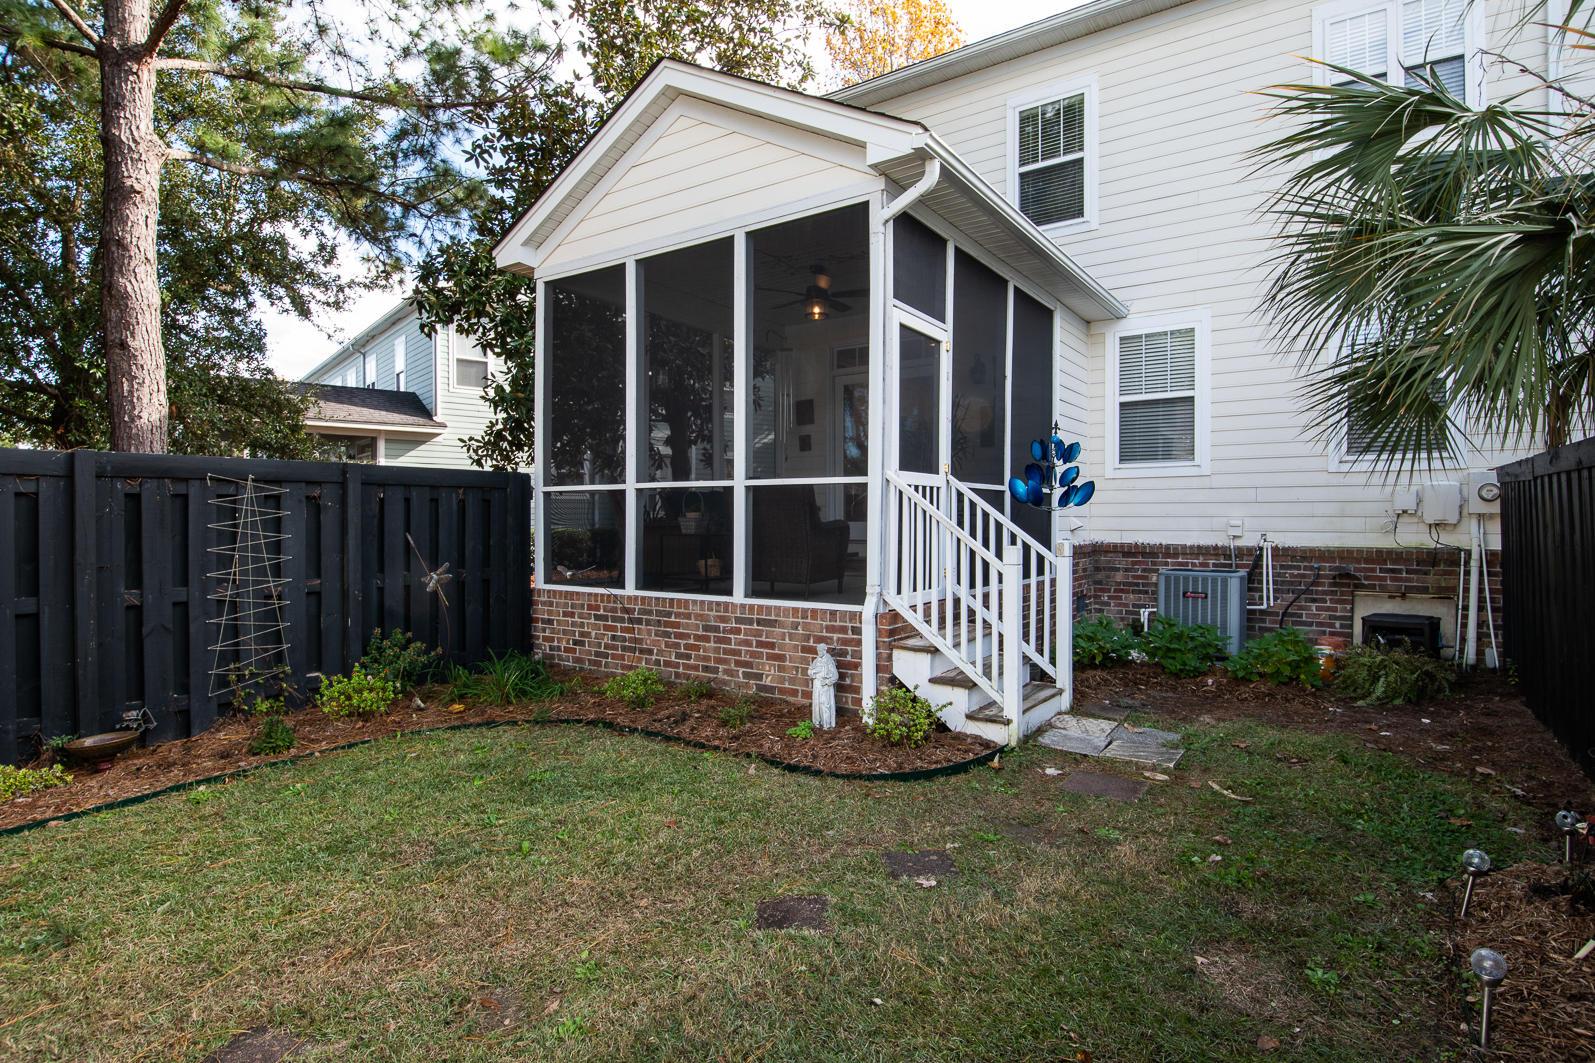 Barfield Park Homes For Sale - 1941 Pierce, Charleston, SC - 31